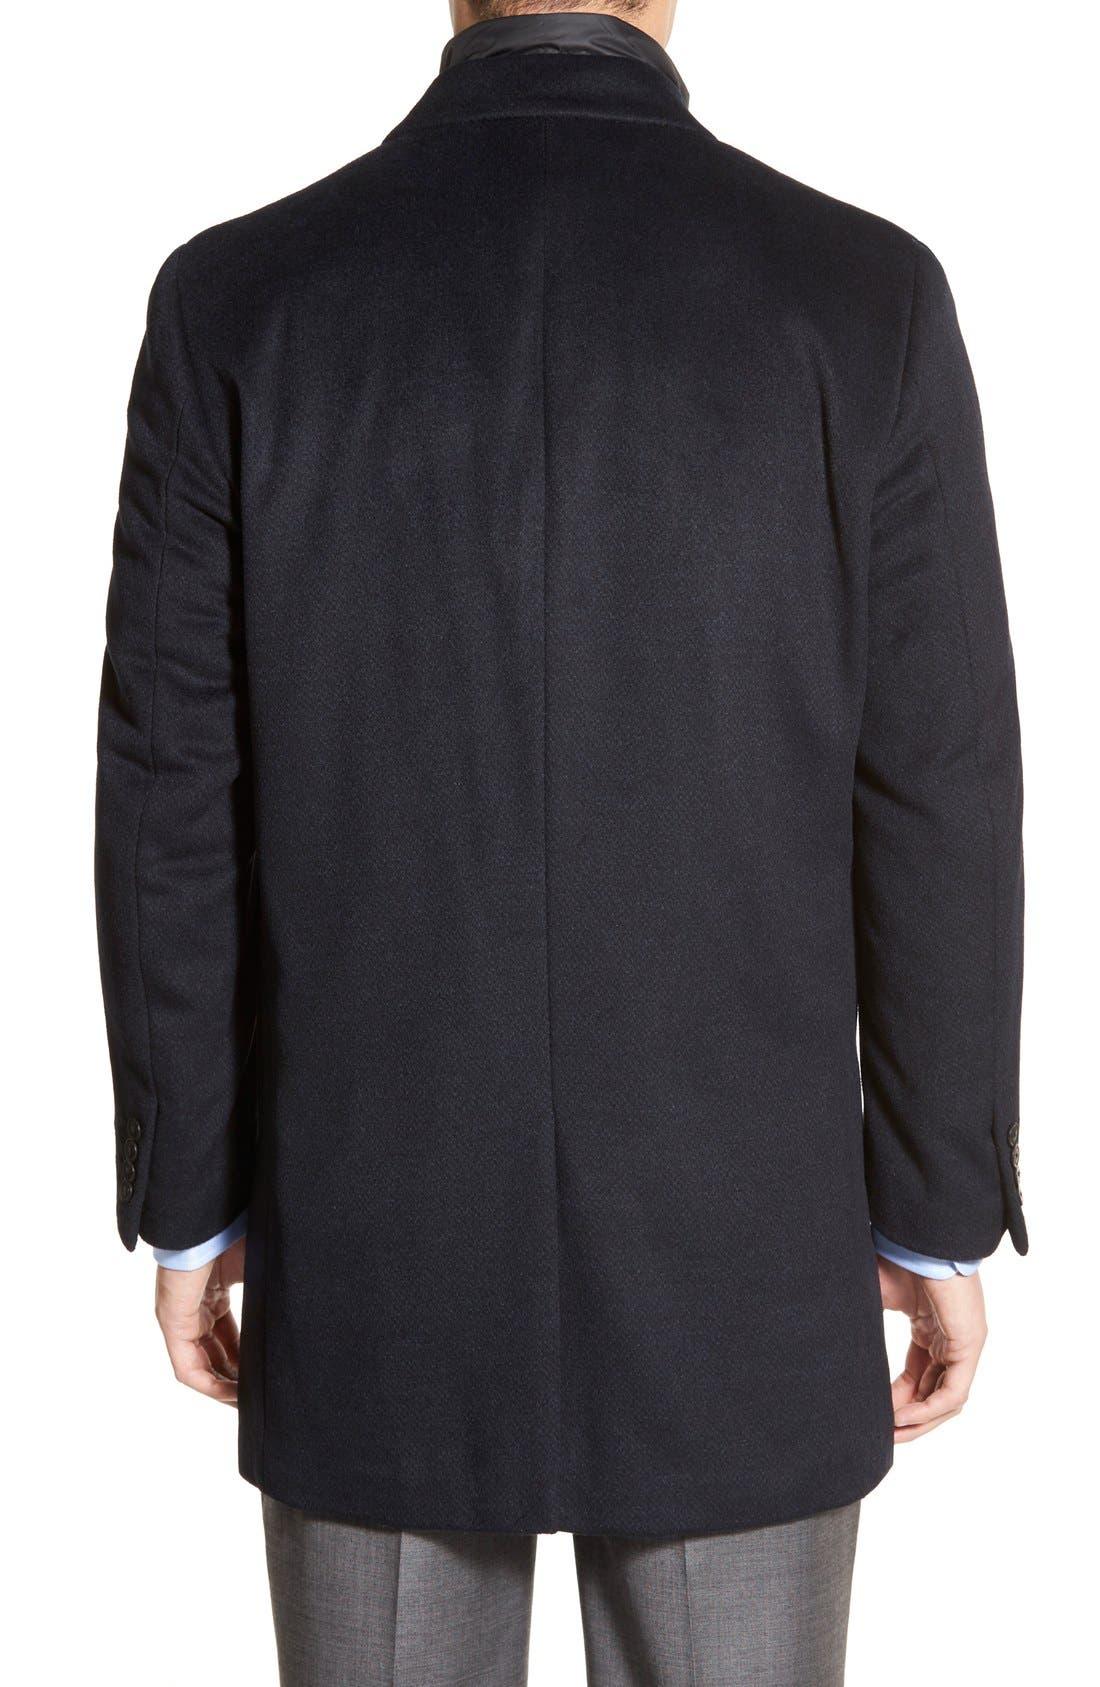 Kingman Modern Fit Wool Blend Coat with Removable Zipper Bib,                             Alternate thumbnail 4, color,